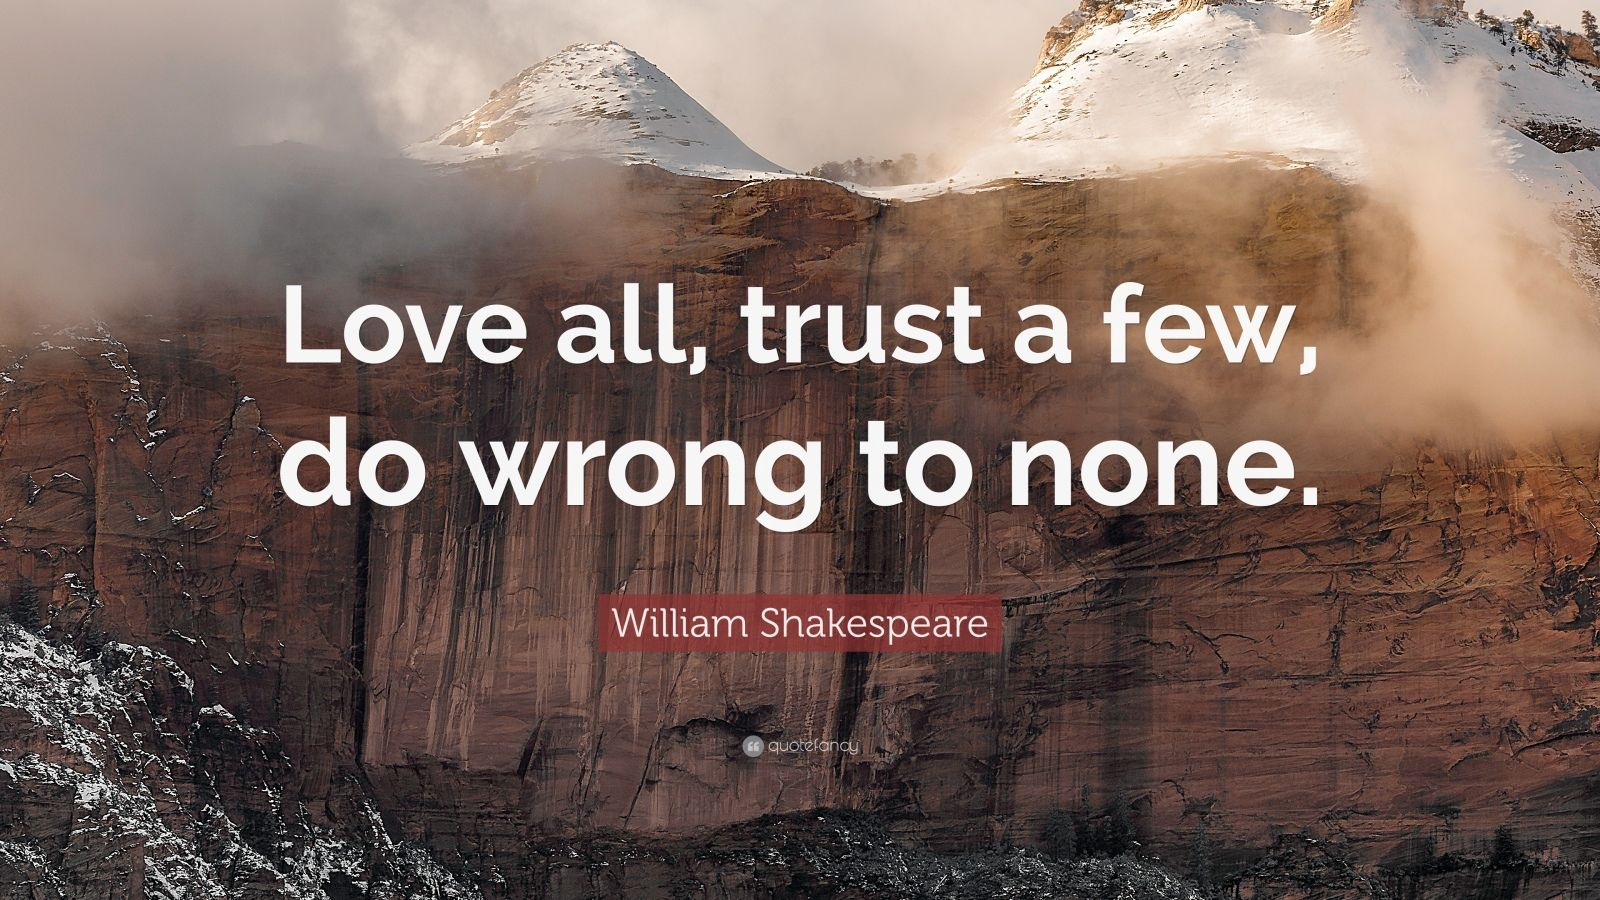 william shakespeare enjoy most faith a new few